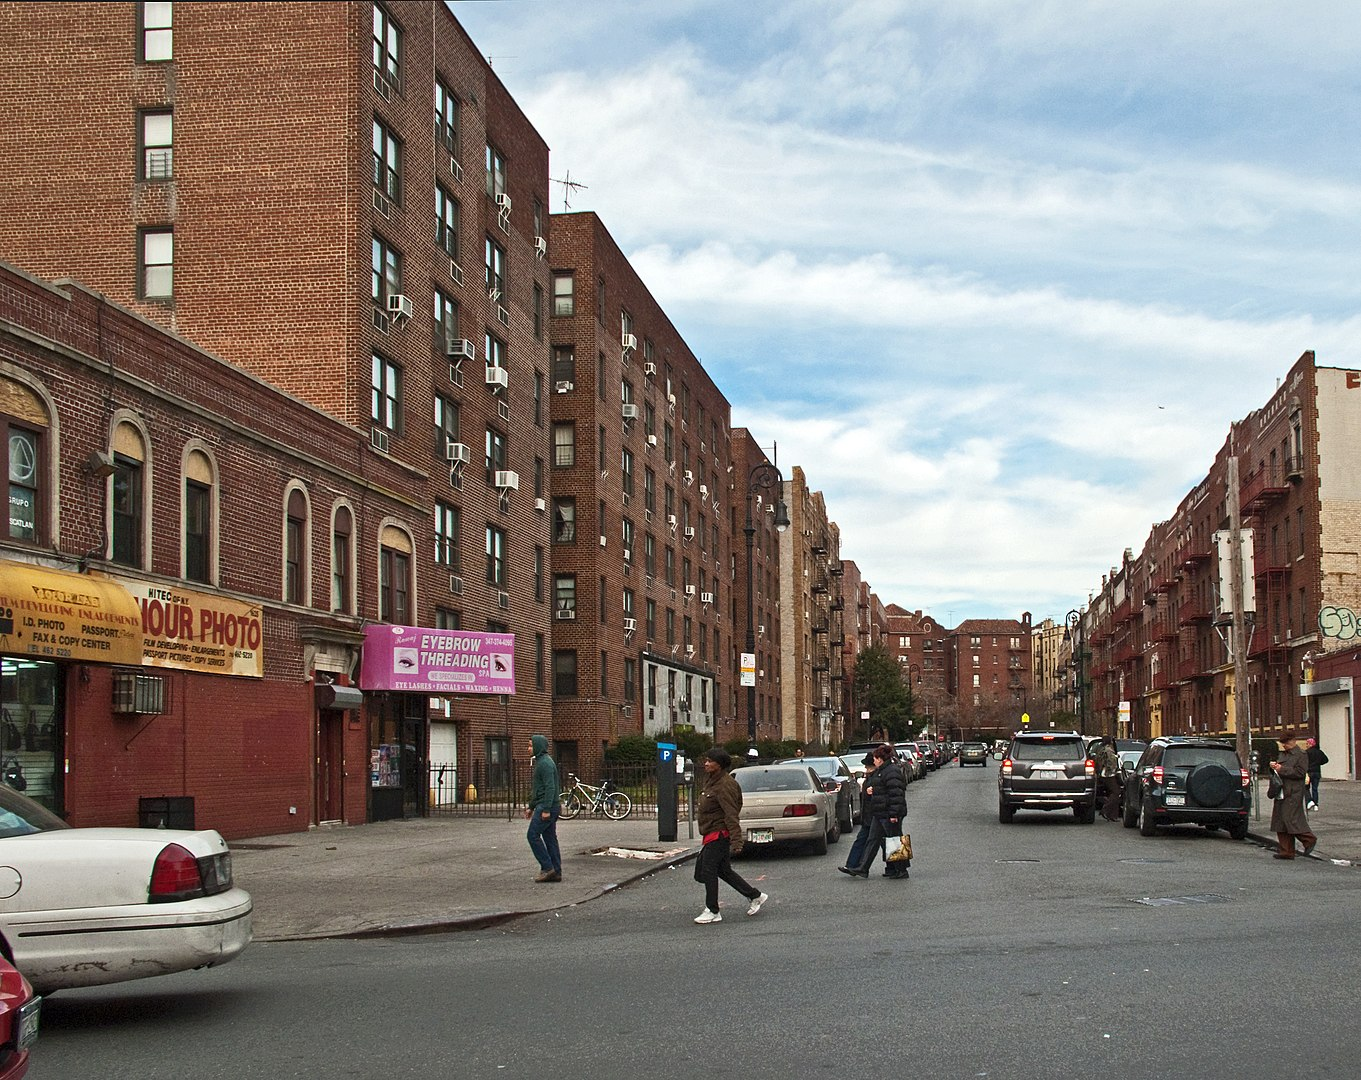 Side-street, east flatbush, find rooms for rent